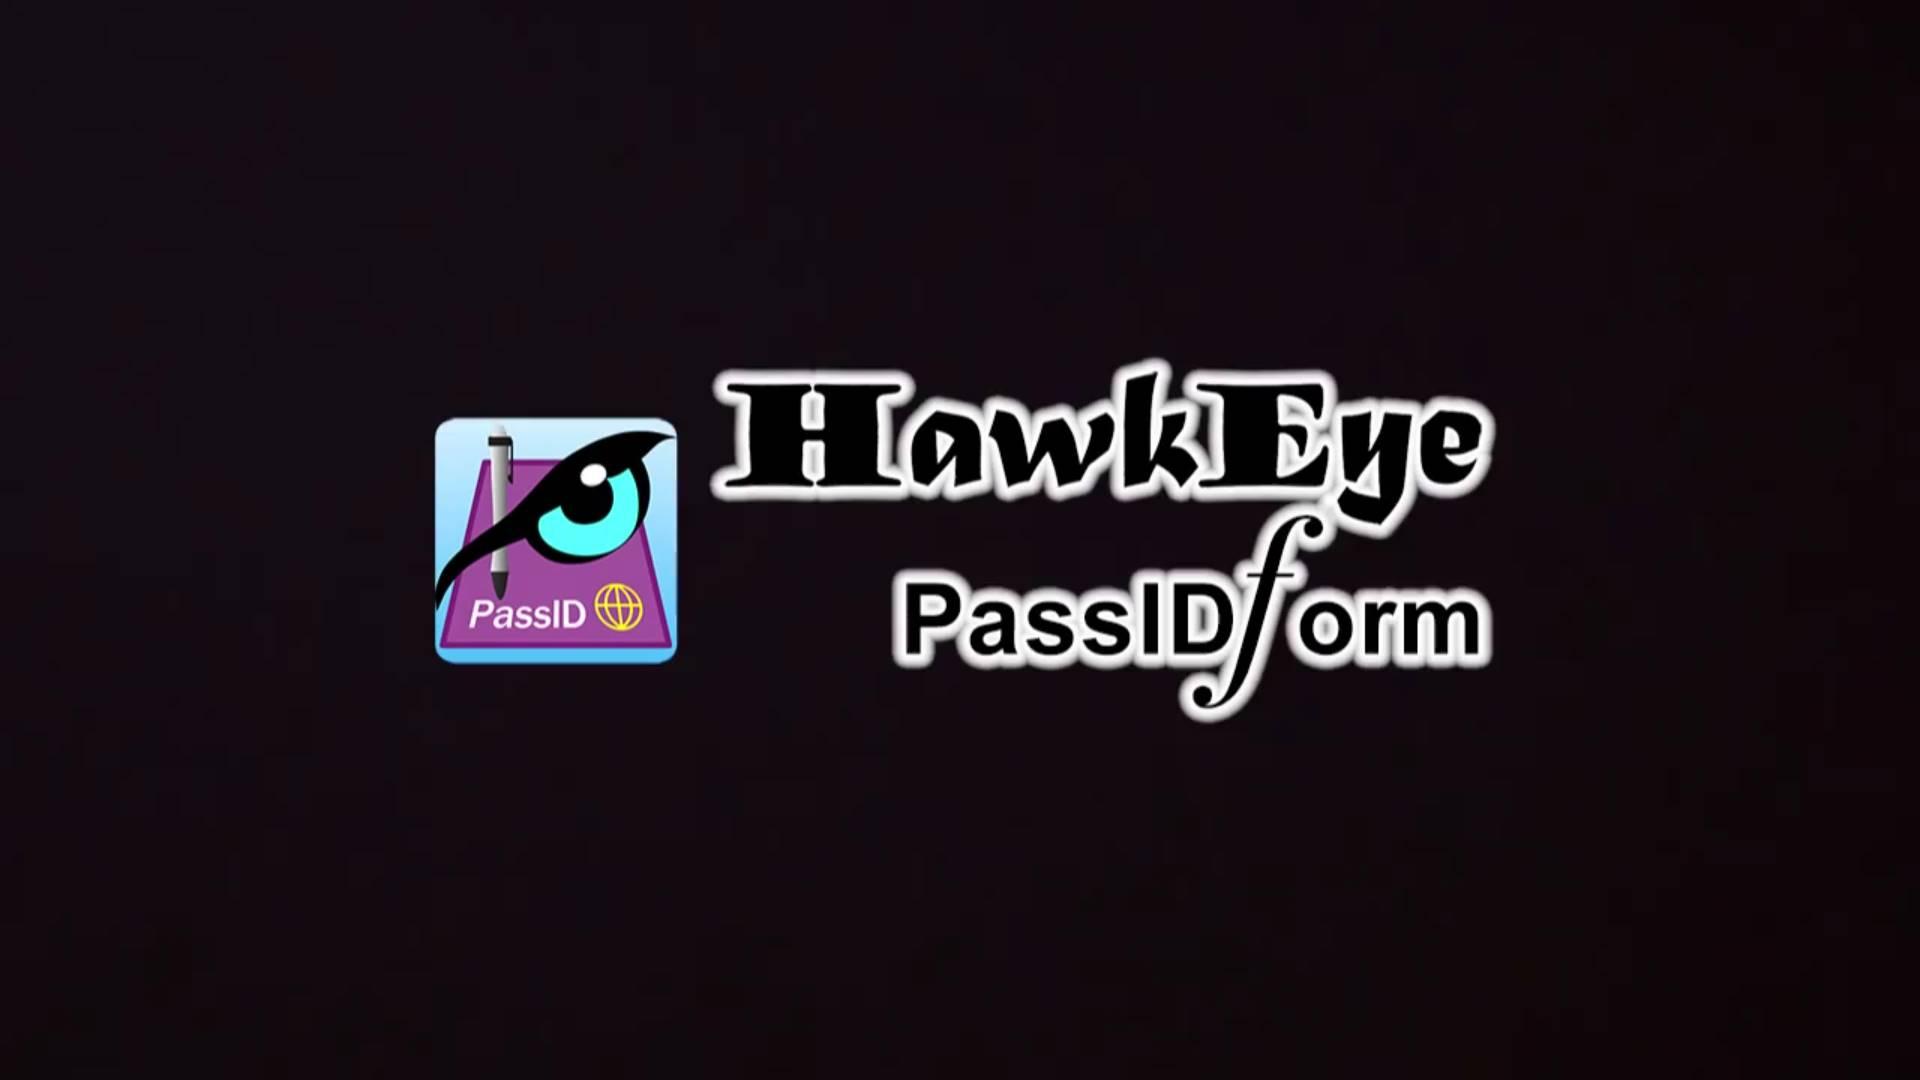 HawkEye PassIDform